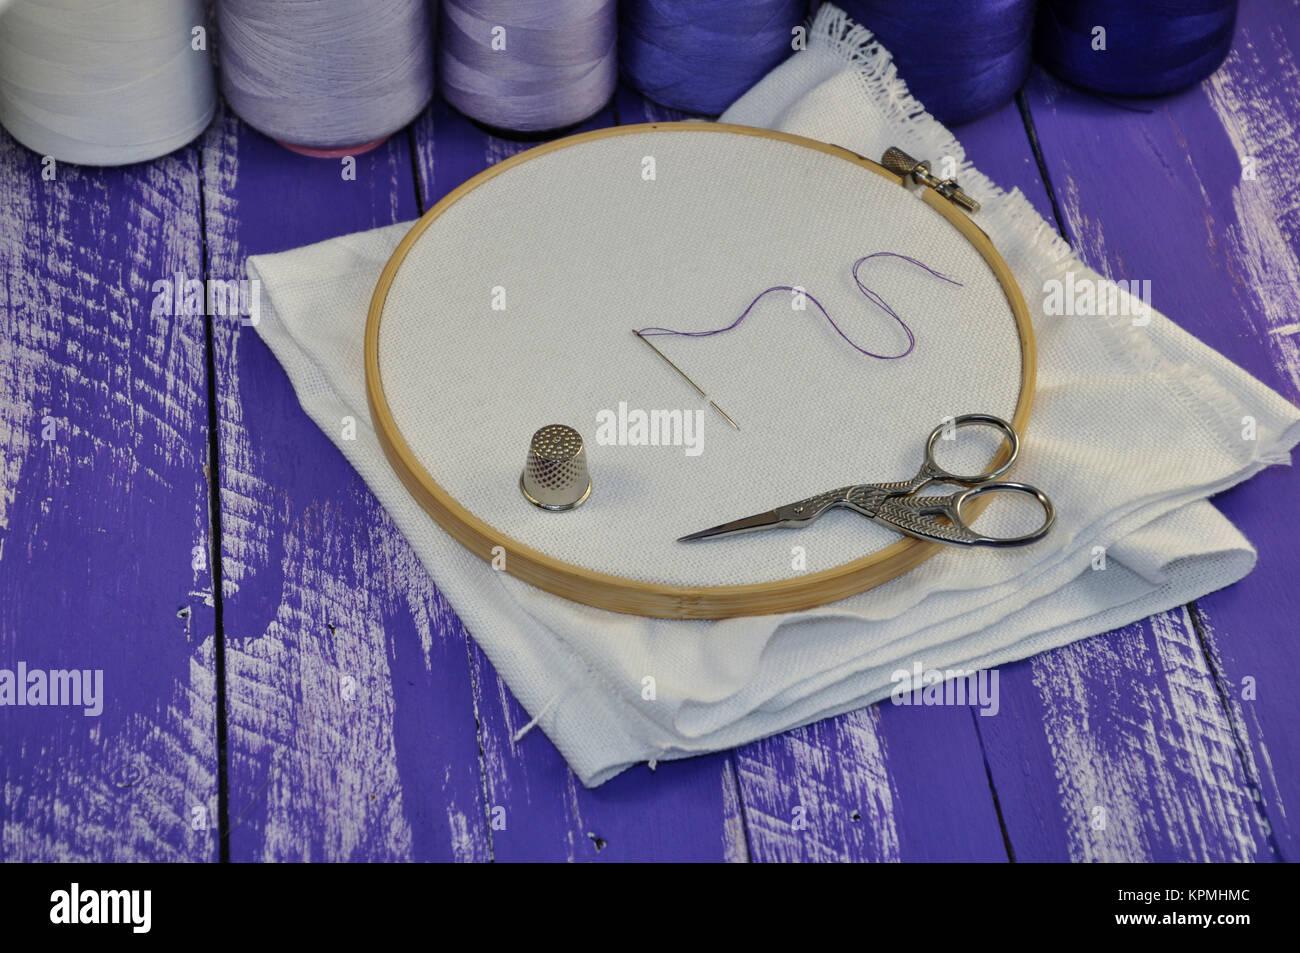 Set of objects for needlework - Stock Image